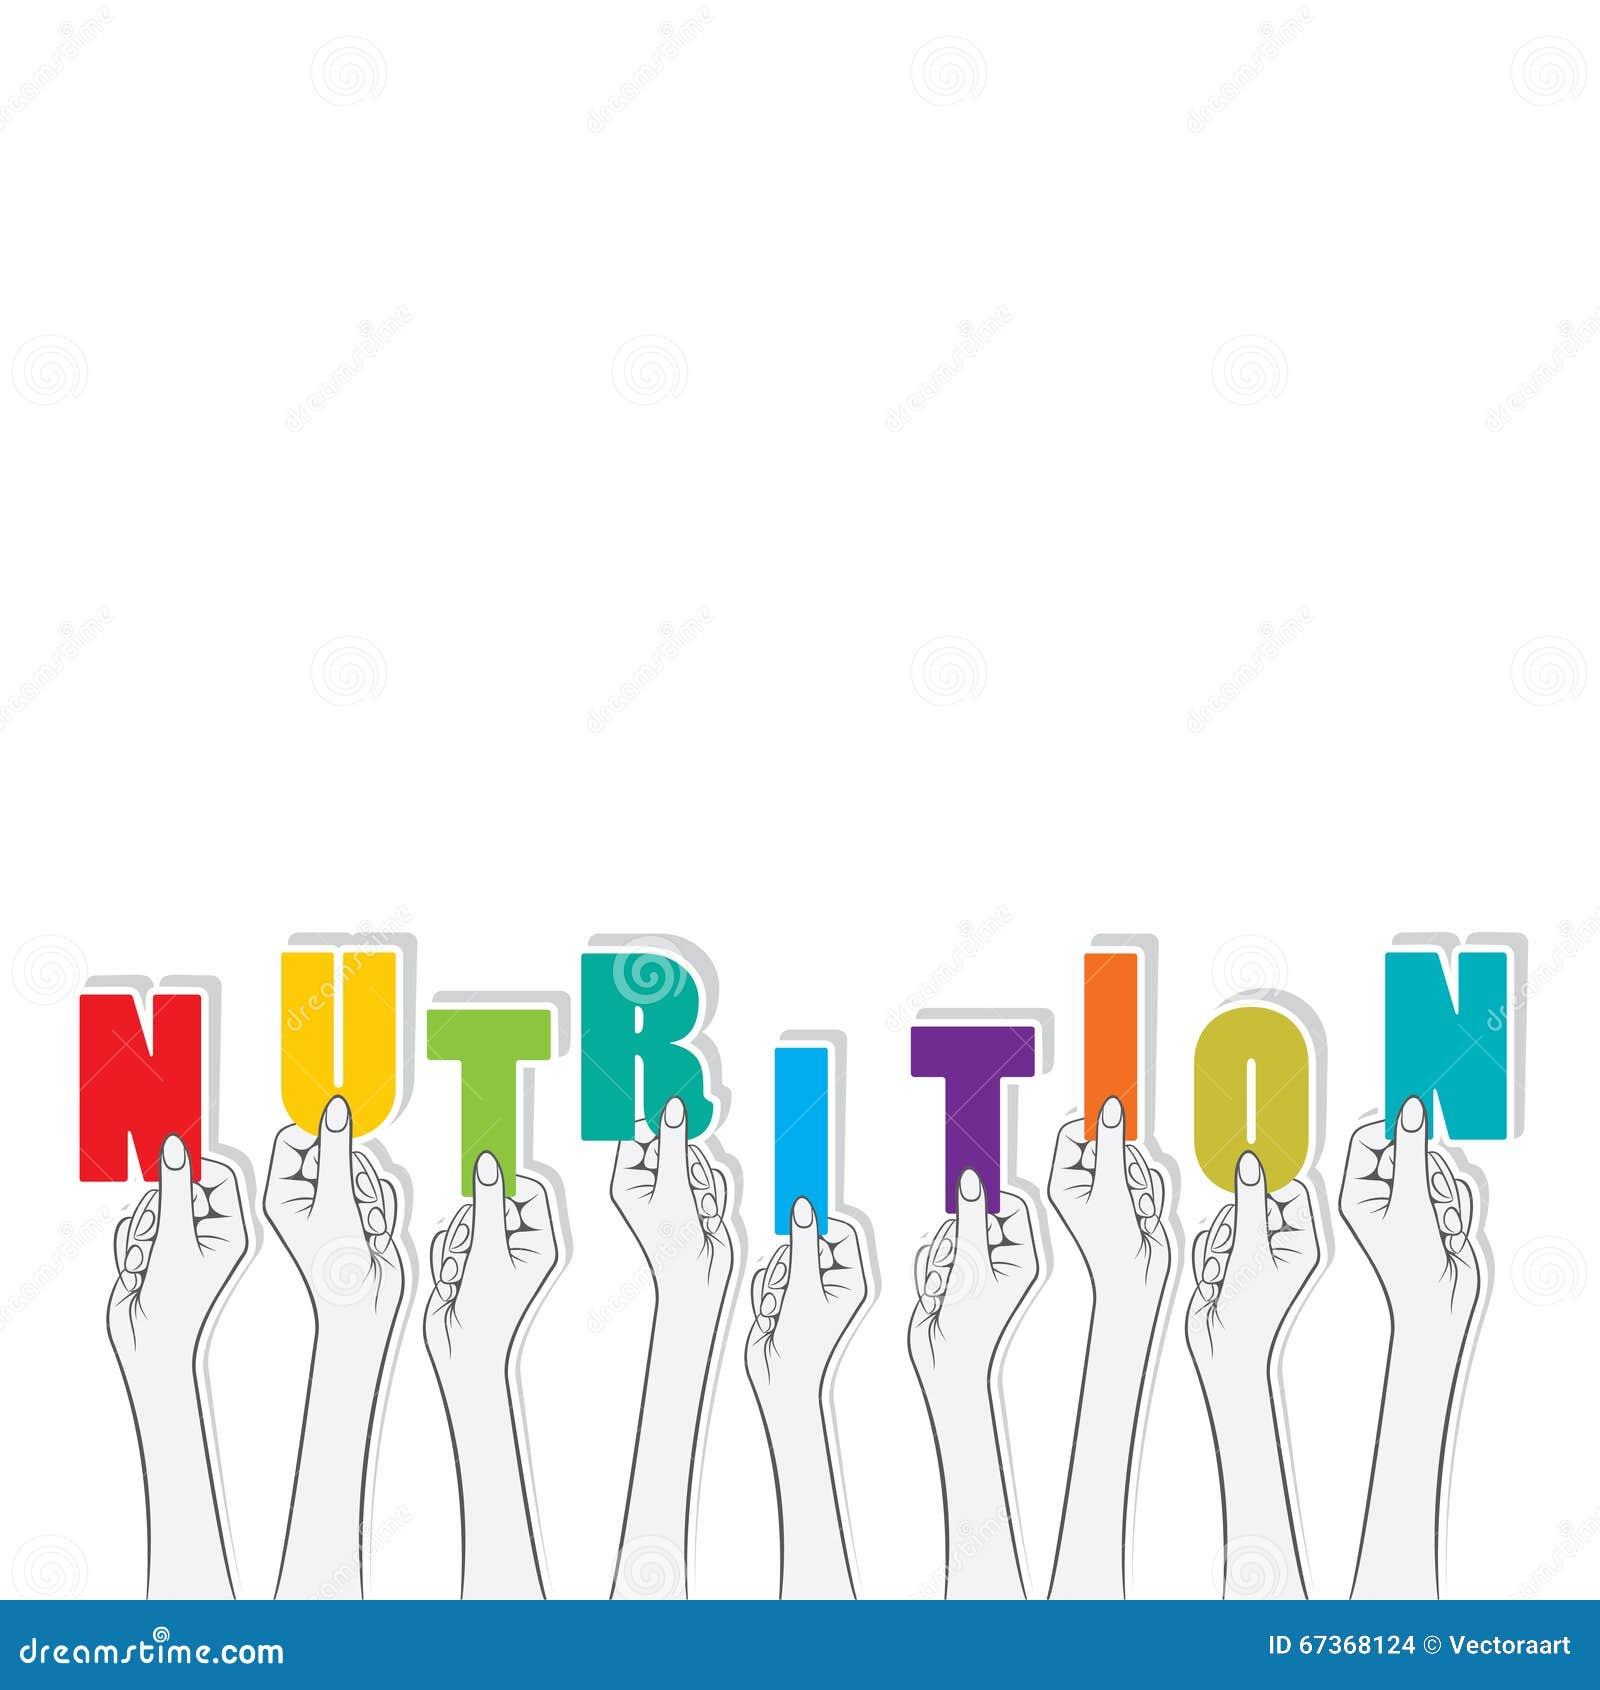 Nutrition text banner design stock vector image 67368124 - Text banner design ...